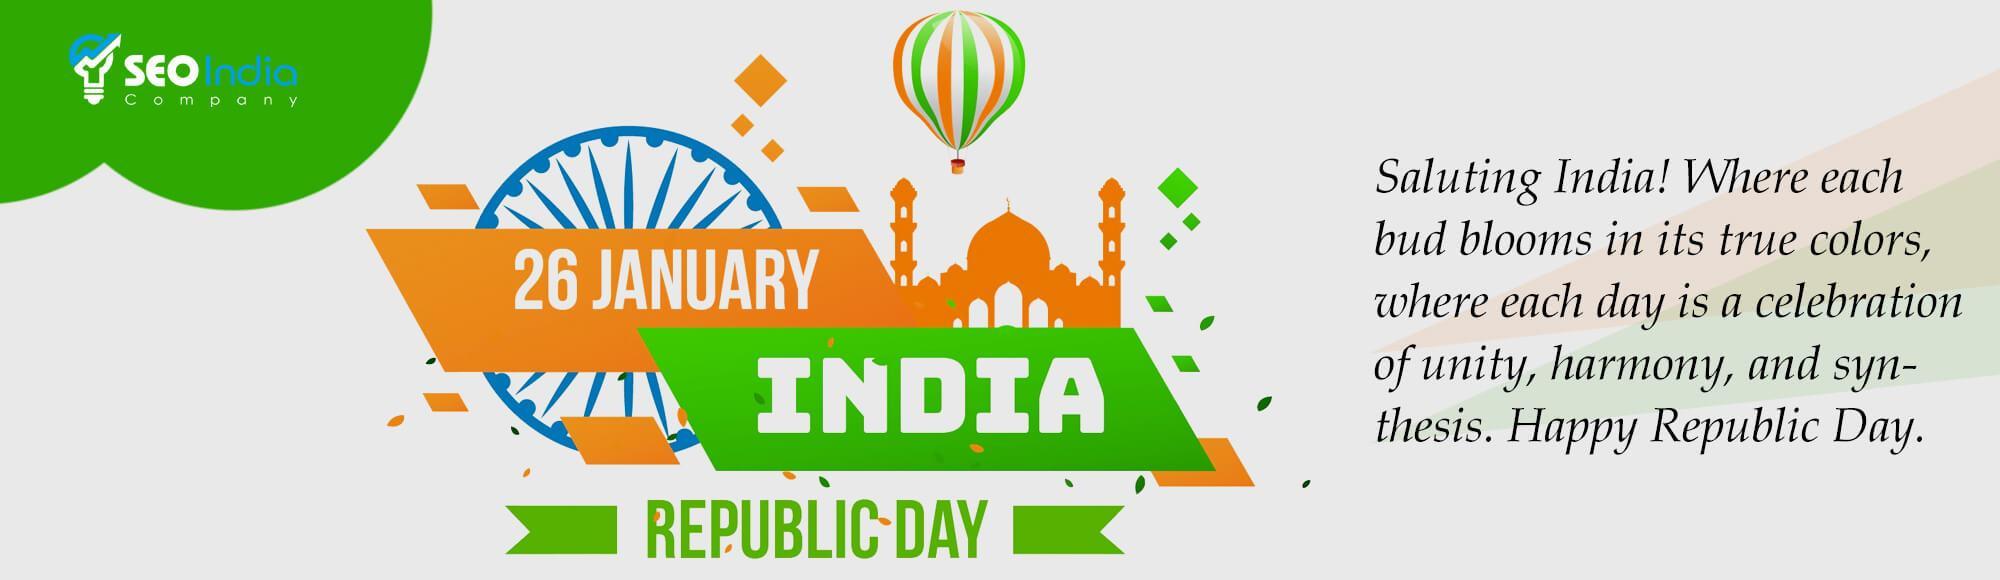 seo-india-republic-day-banner